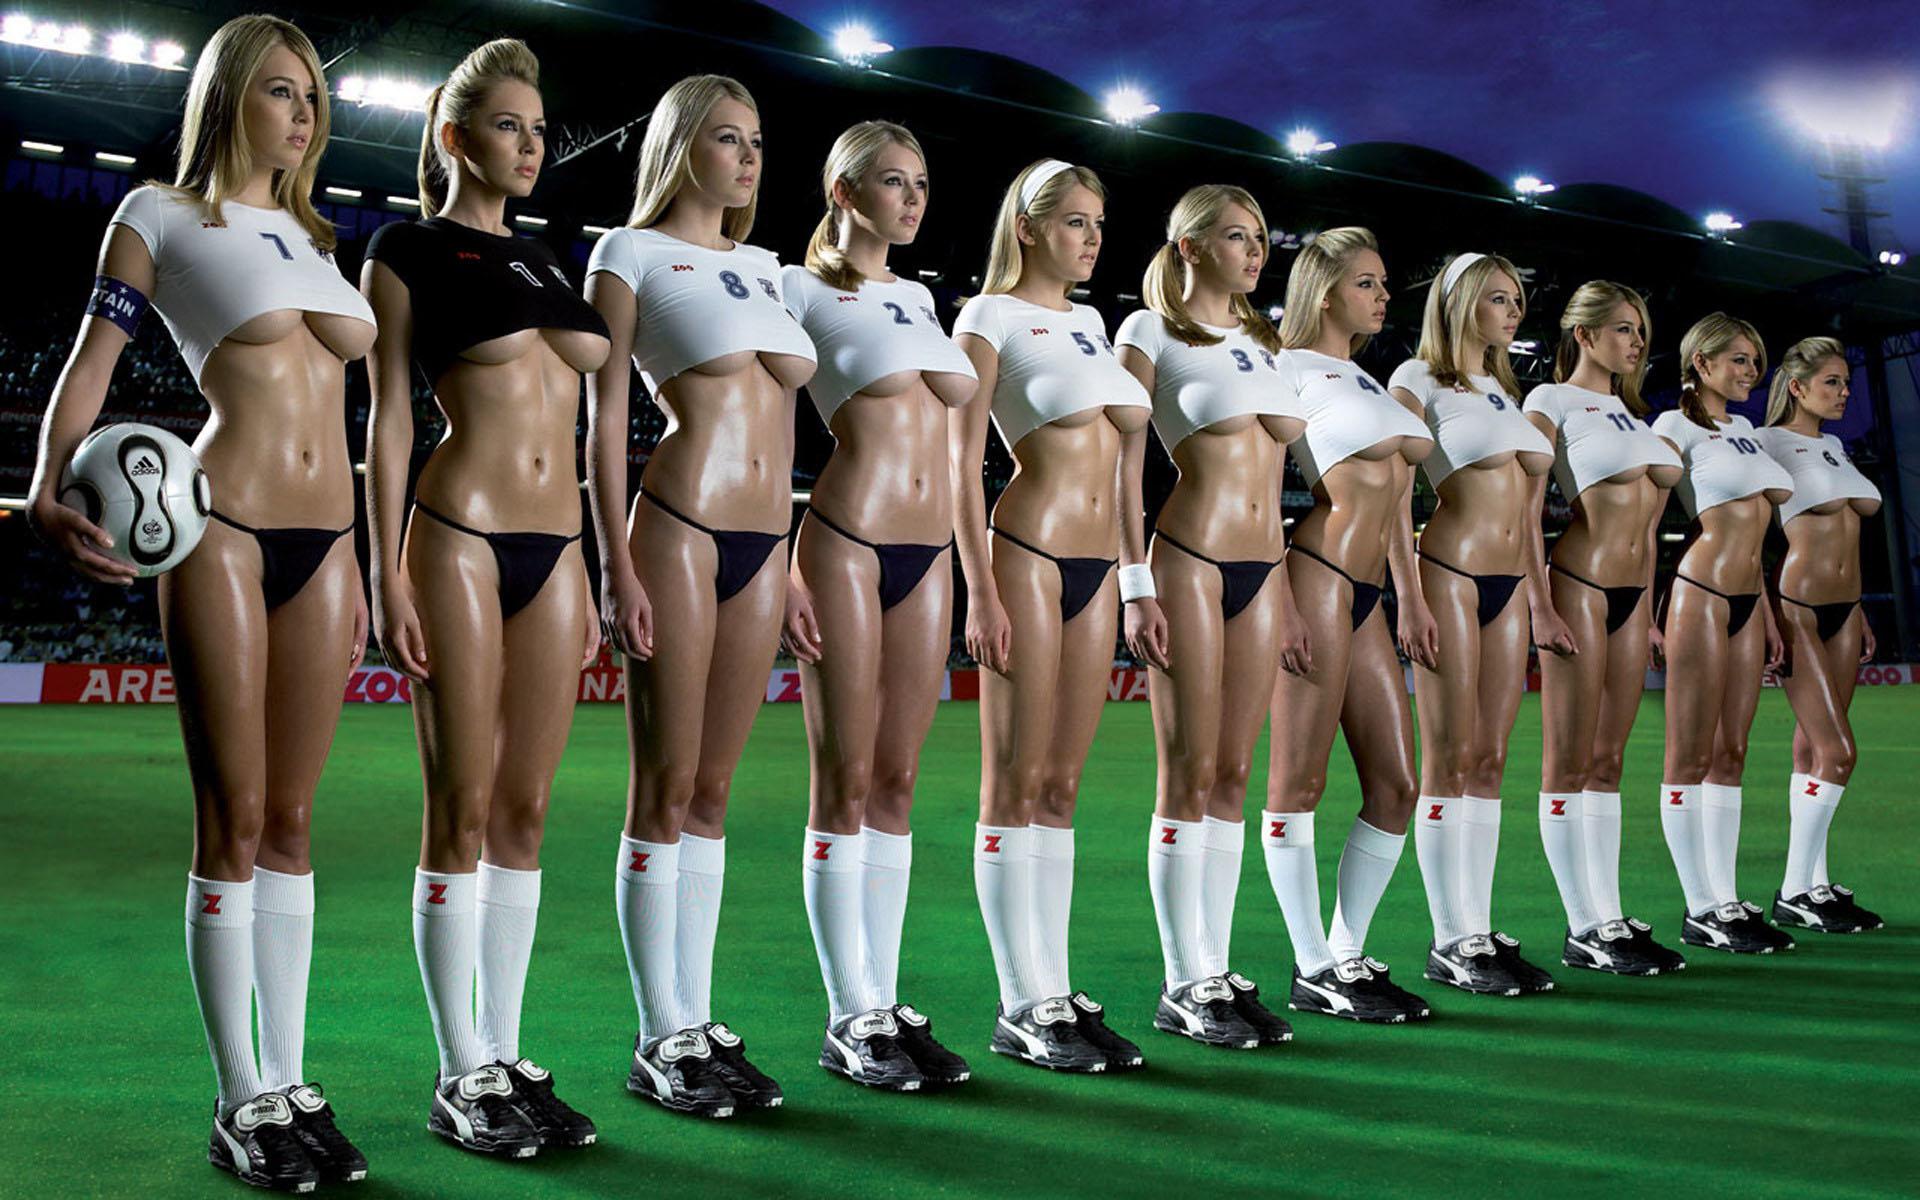 сексуальная футбольная команда